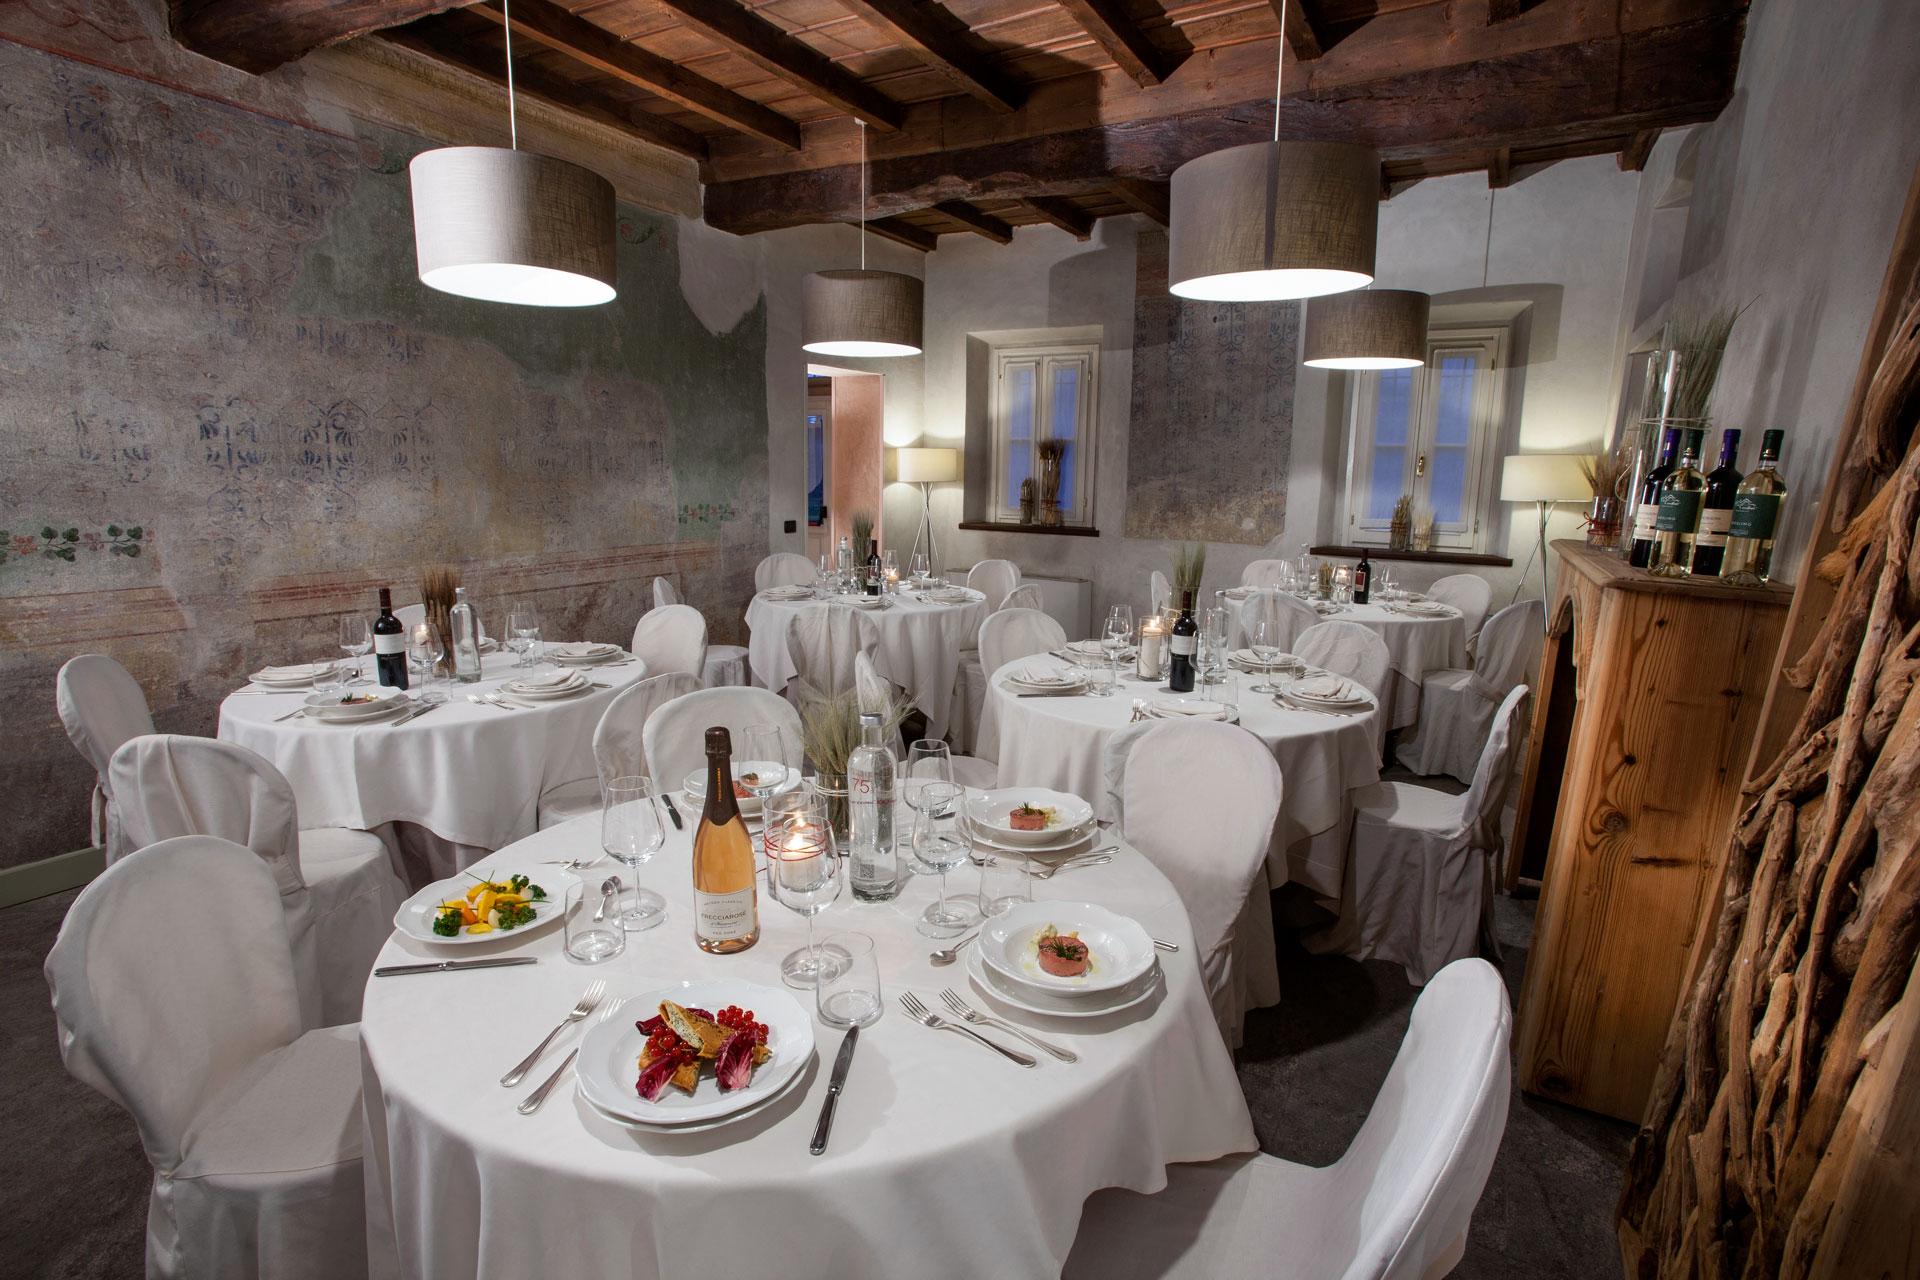 Cucina tradizionale lombarda in chiave Gourmet